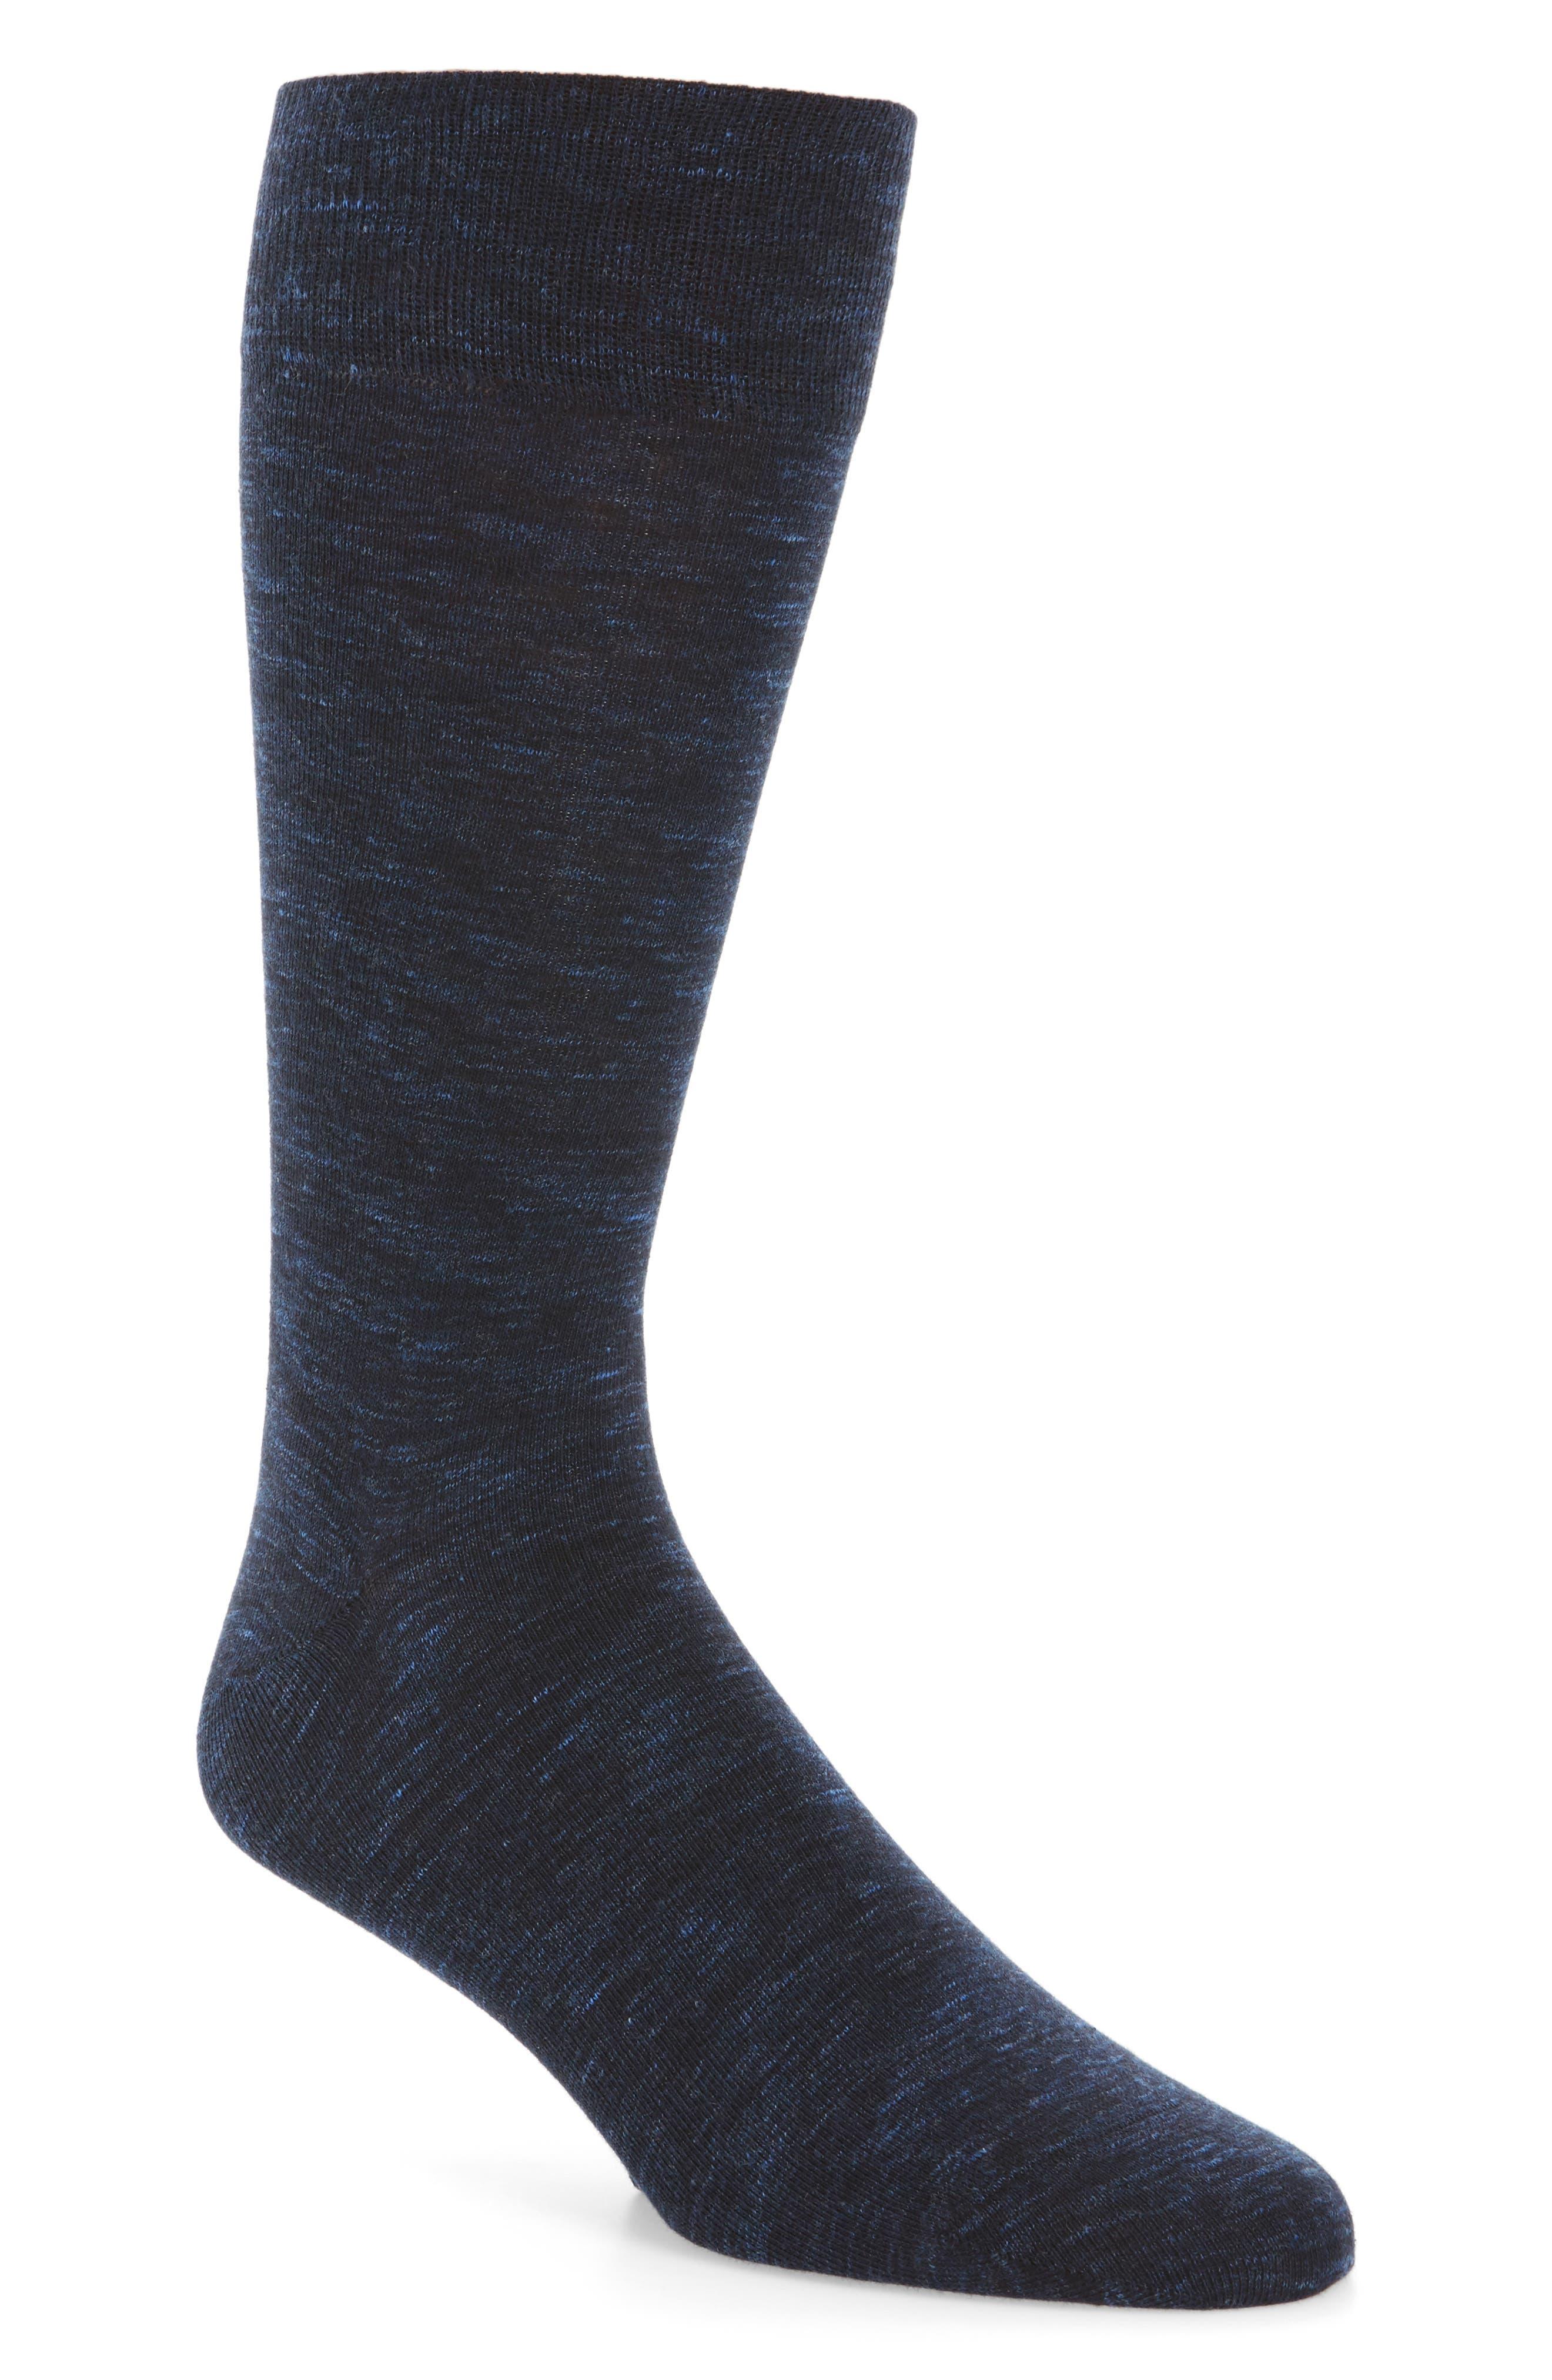 Twist Socks,                         Main,                         color, Navy